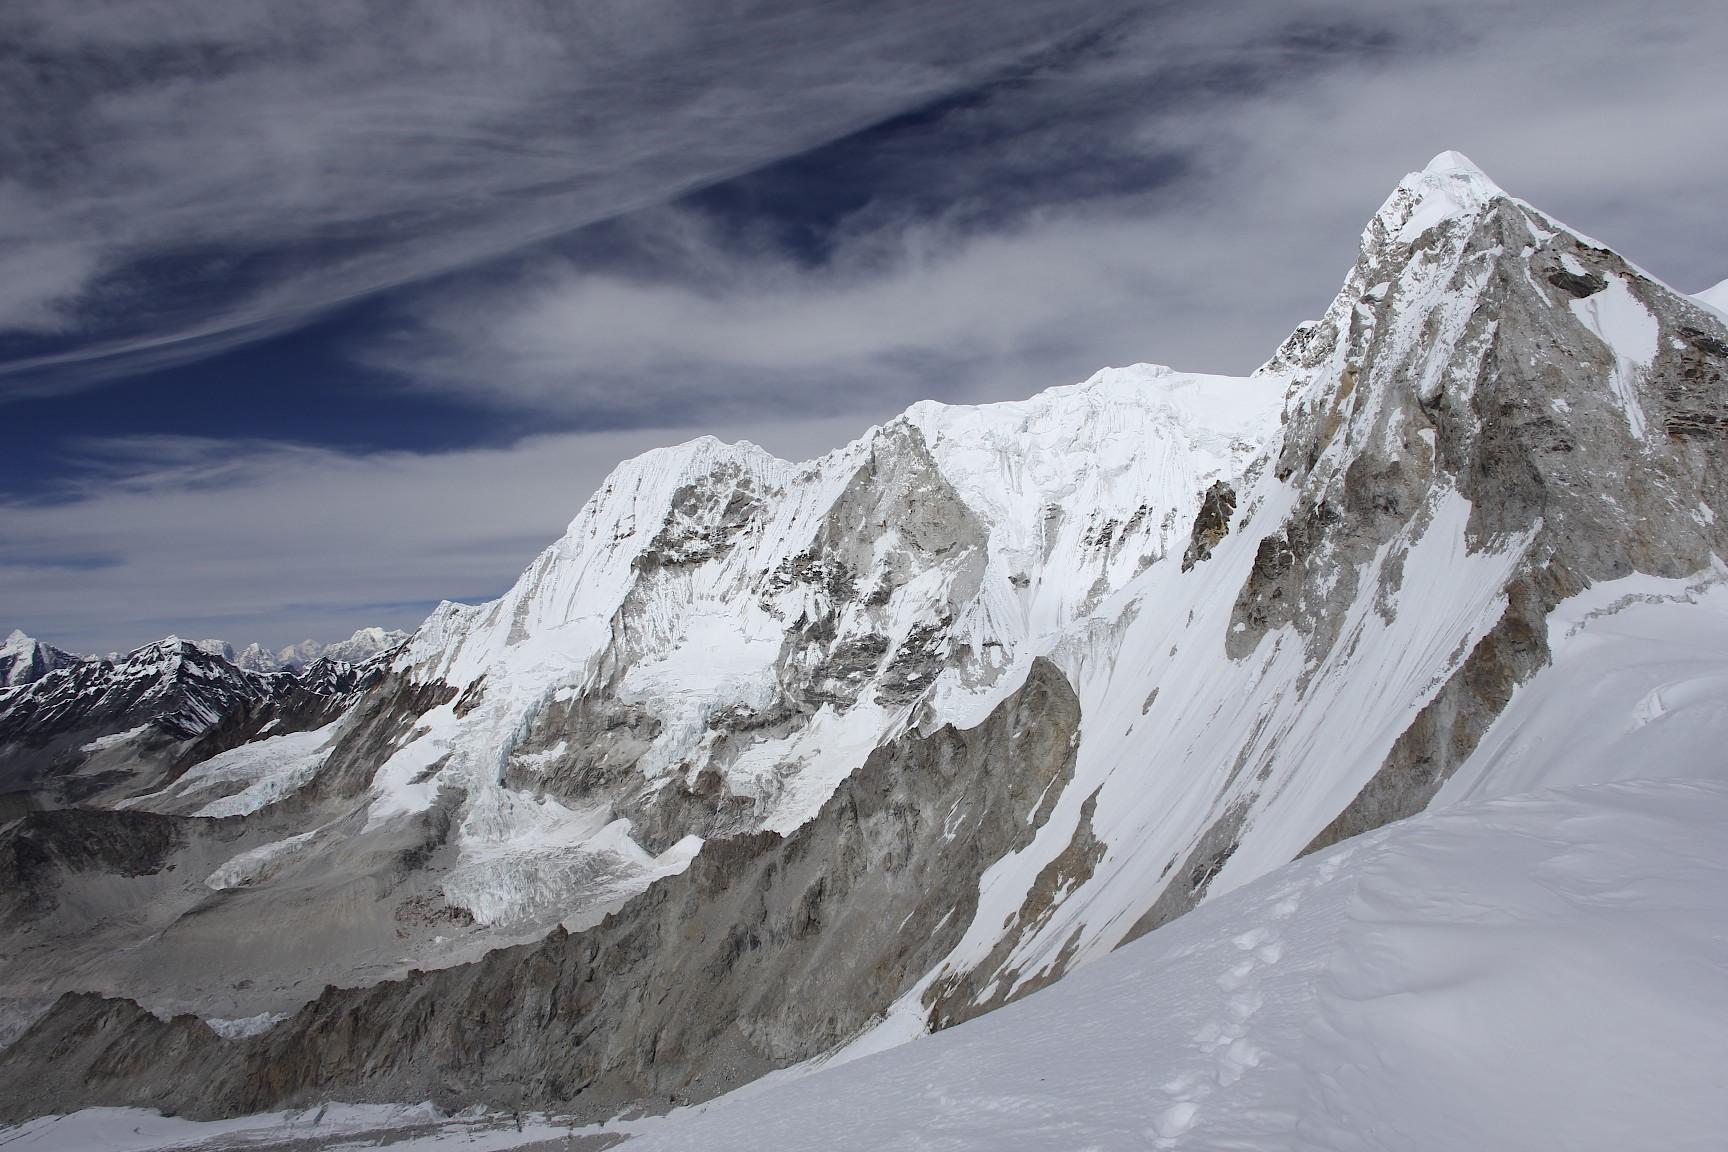 The massif of Baruntse